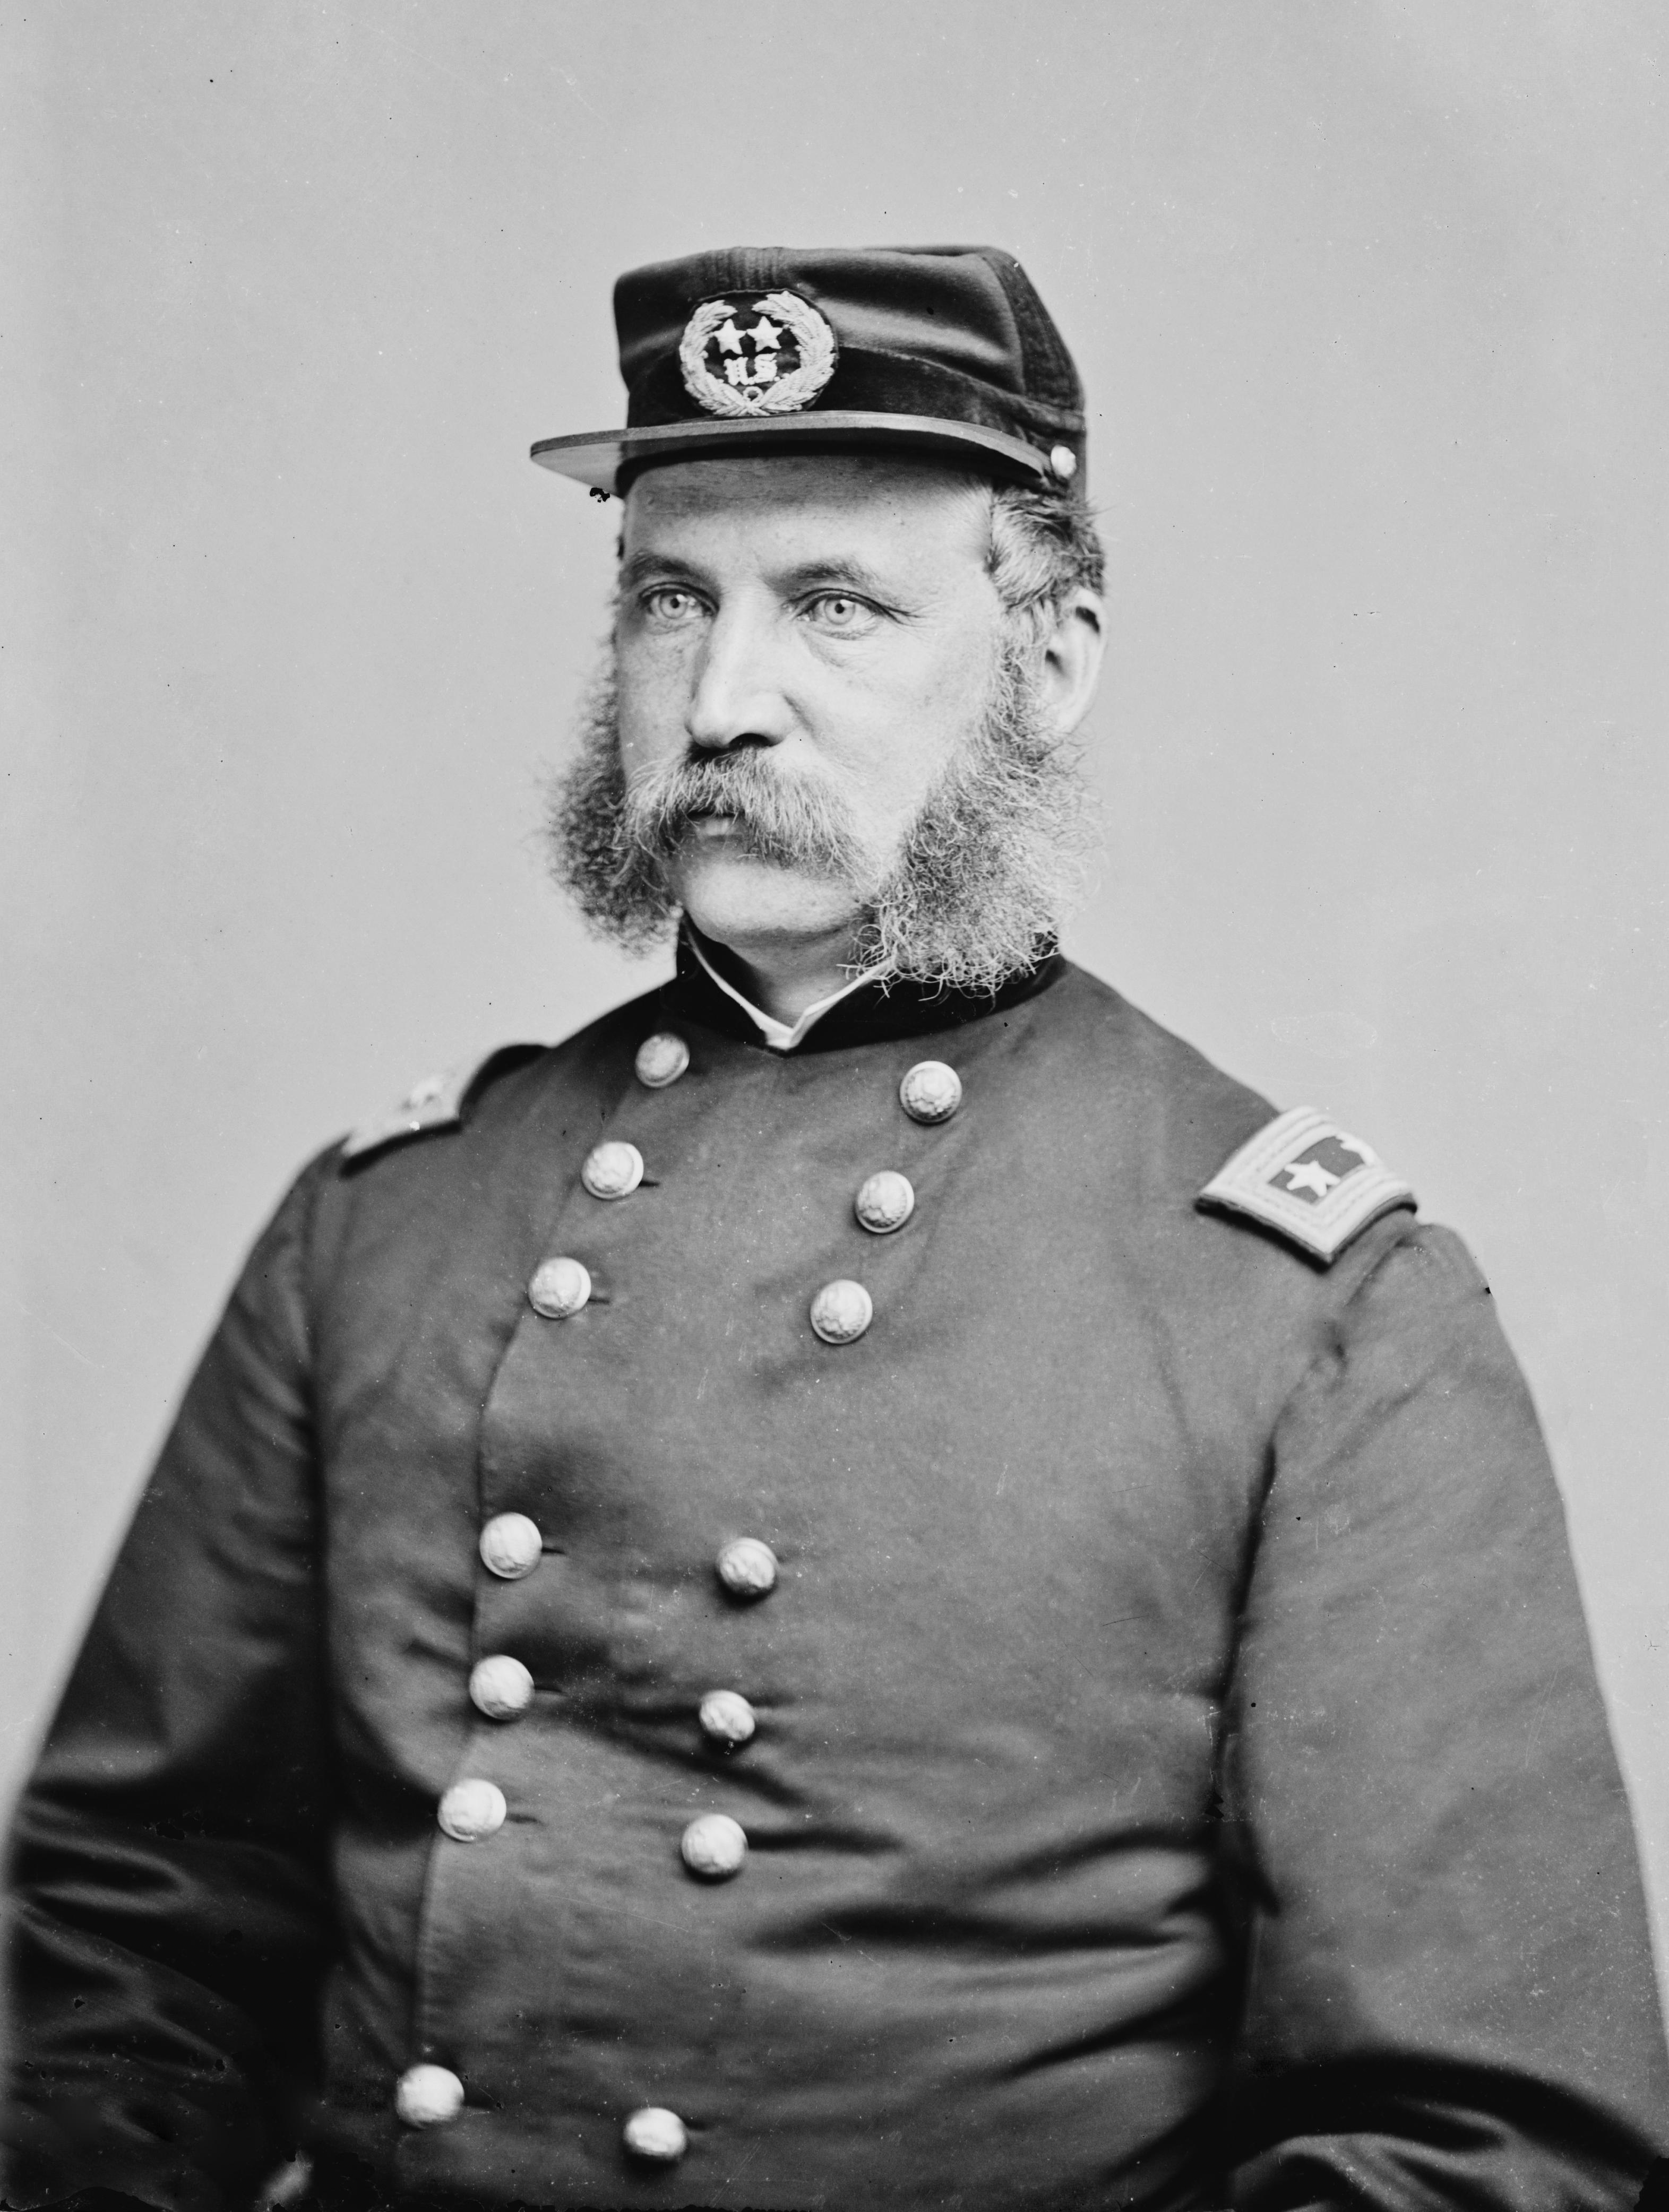 Major-General John Gray Foster (Library of Congress)